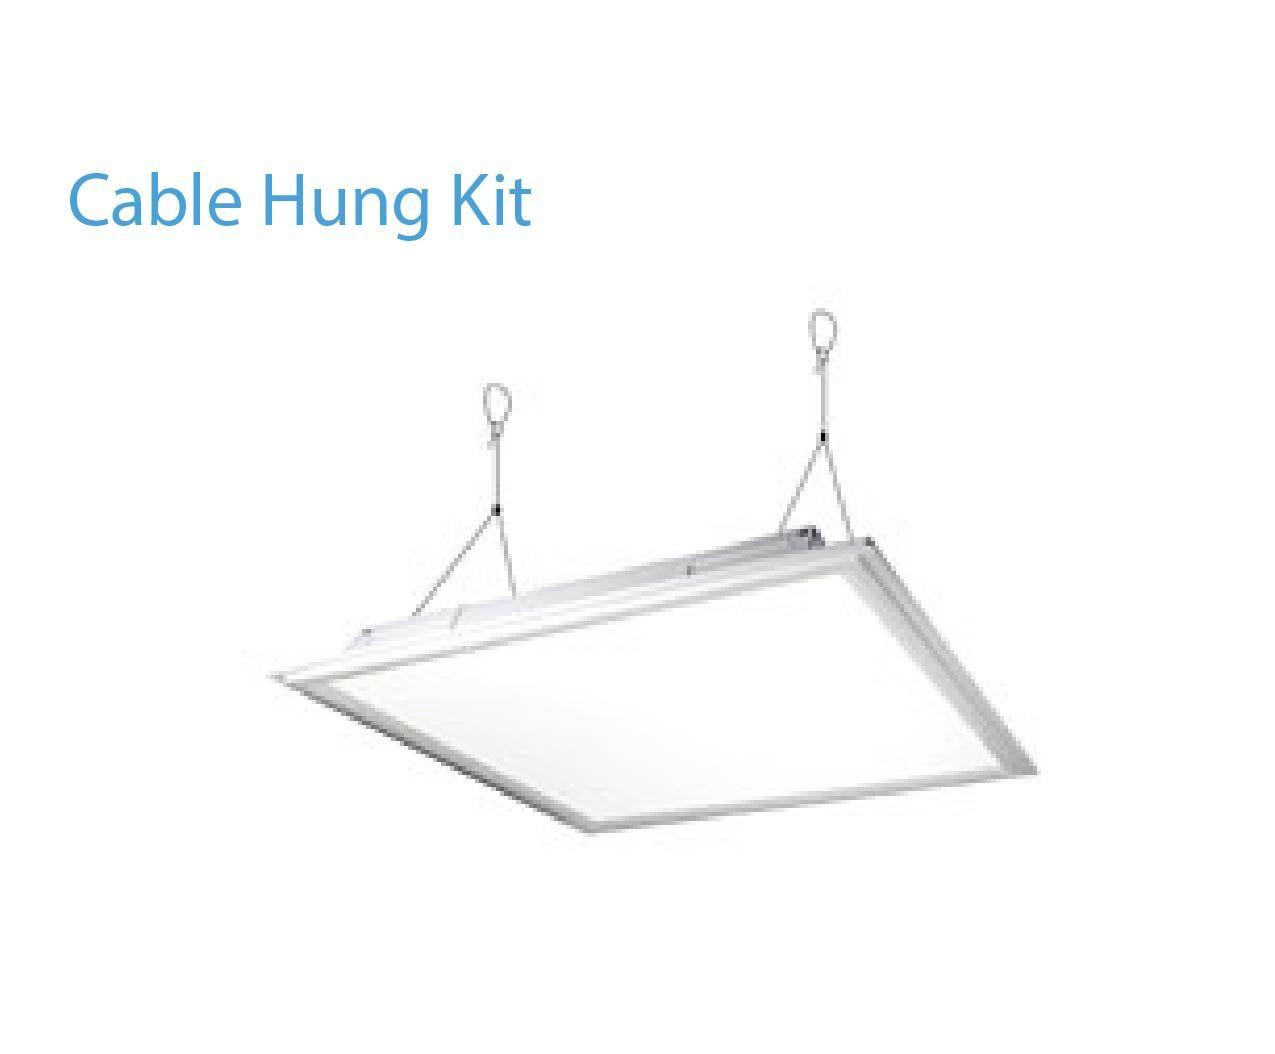 Maxlite Direct Lit Mlfp14ds Led Commercial Ceiling Light 40 Watts Lumens K 1x4 Flat